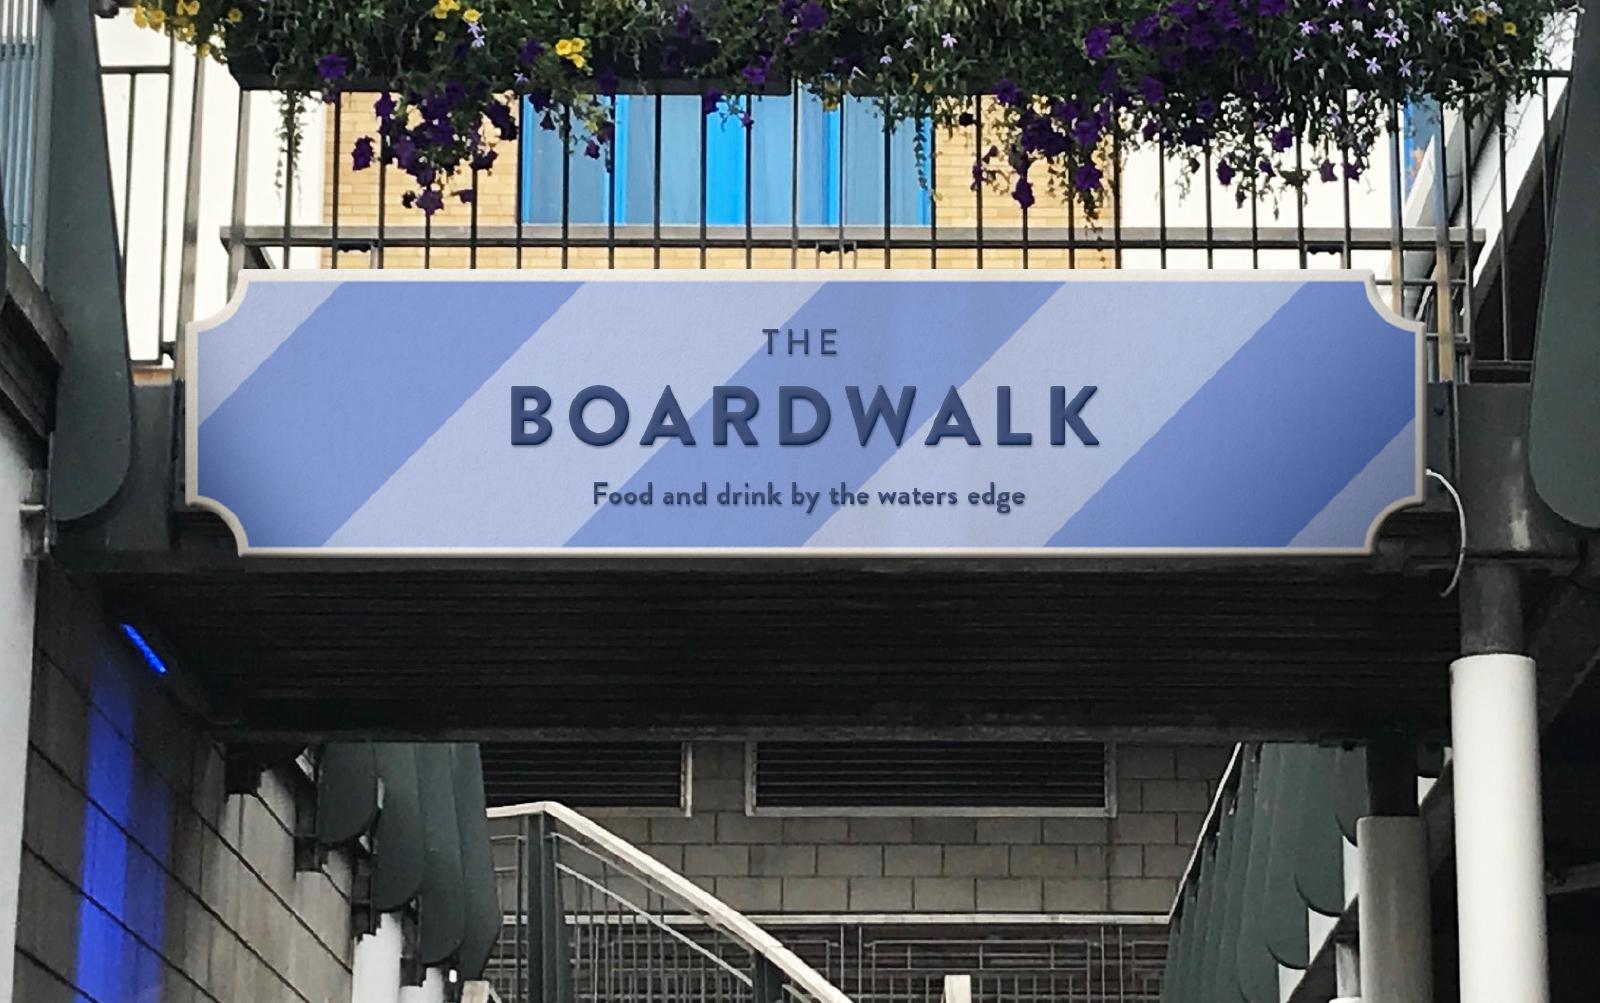 BrightonMarina_Article_Signage2